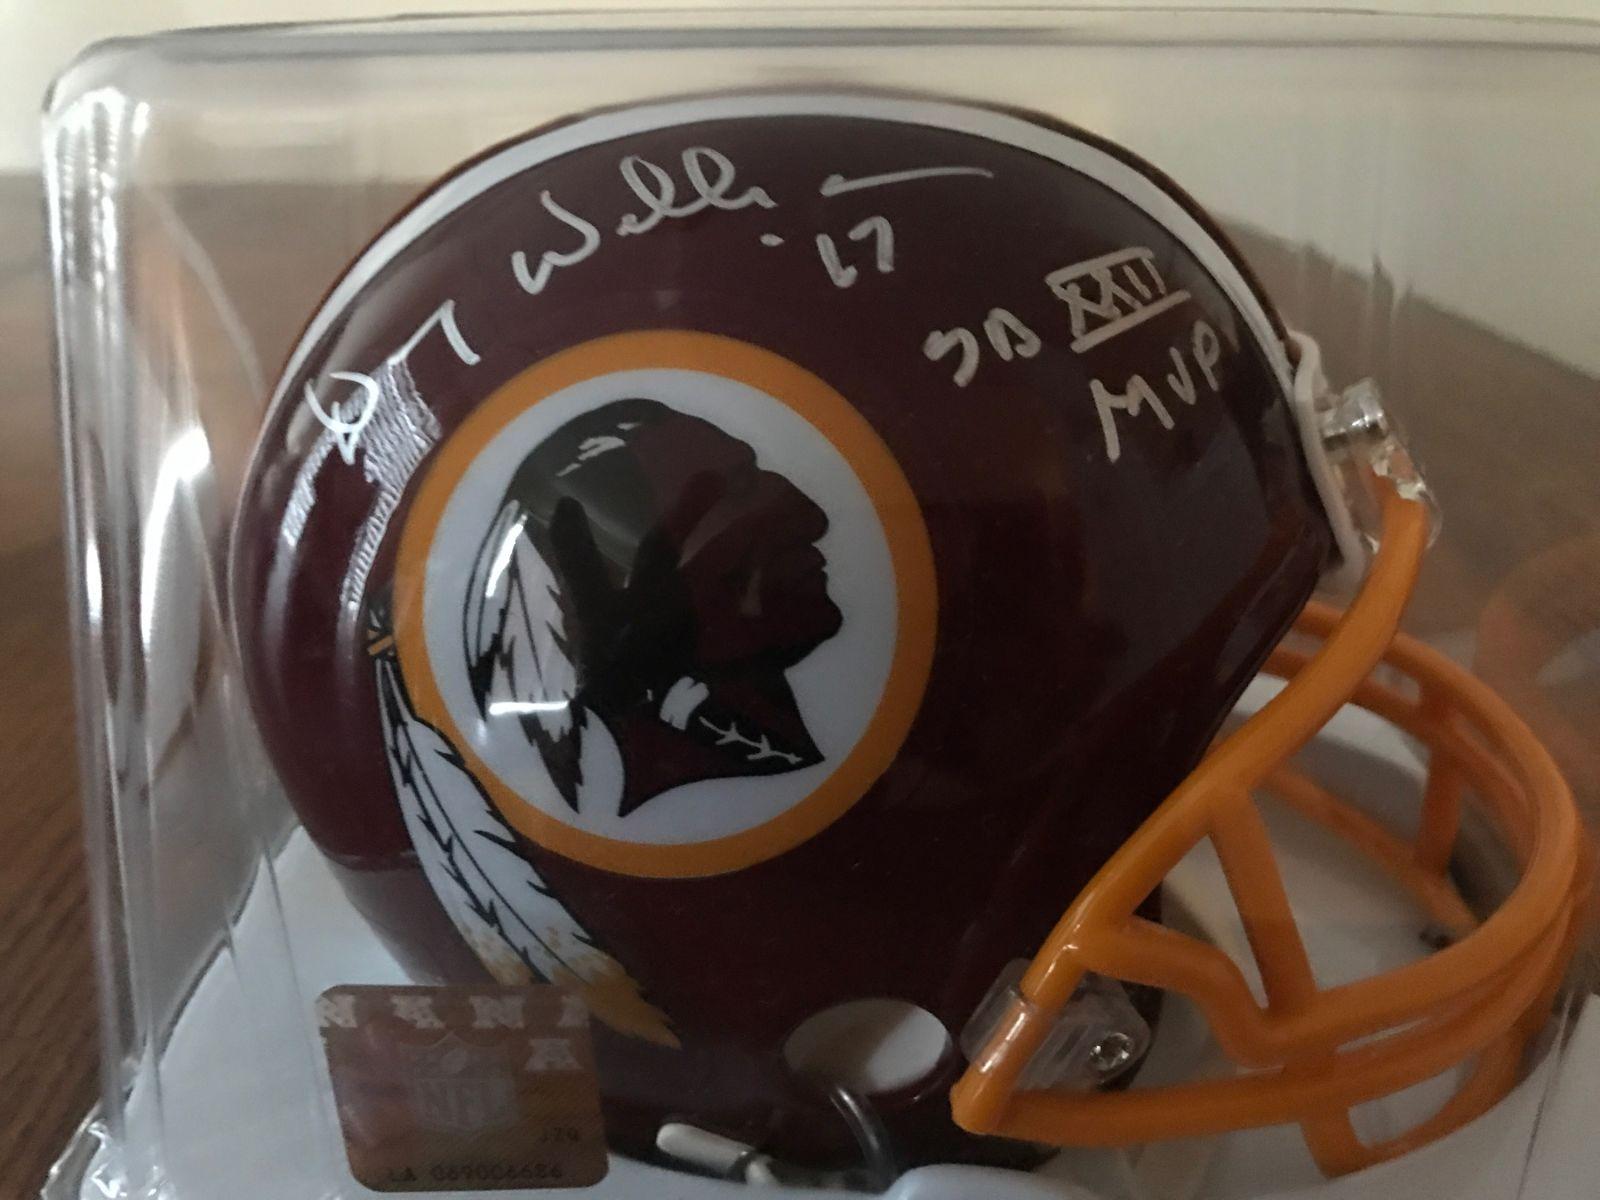 new arrival aebb0 9f262 Auction Page | Doug Williams, Washington Redskins ...